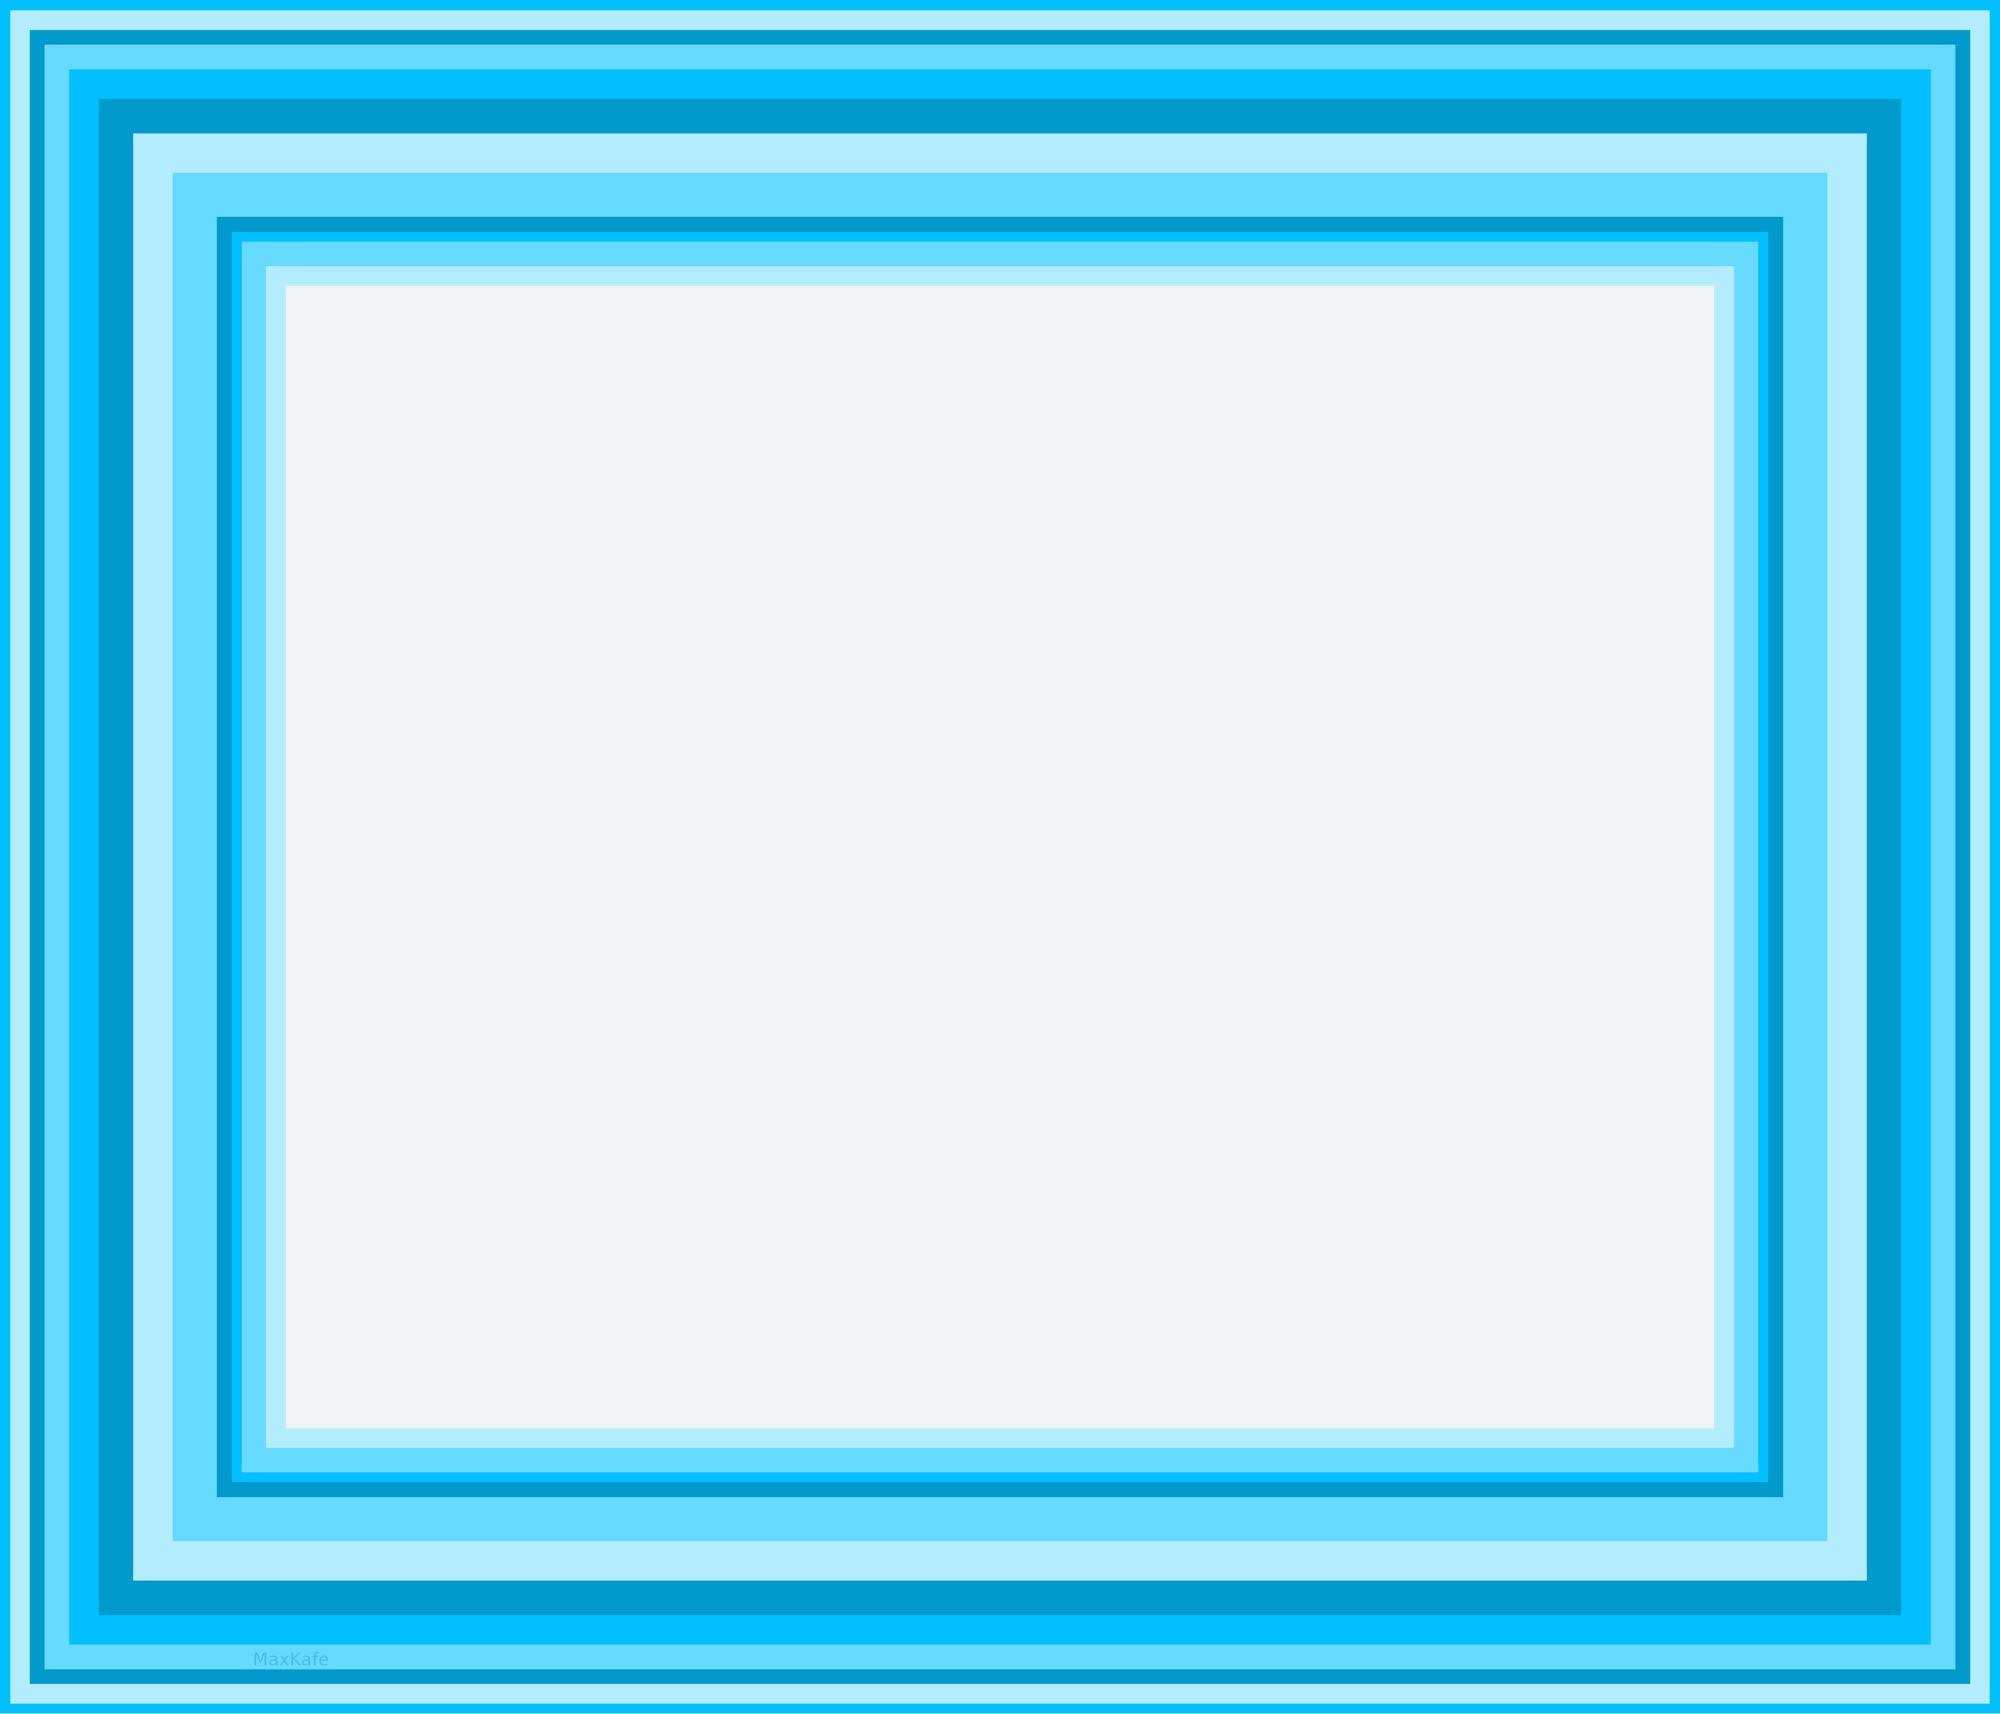 "MK16LFS120 Frame 6x7 Turquoise <a href=""https://dl.orangedox.com/kahrmA"">[DOWNLOAD]</a>"